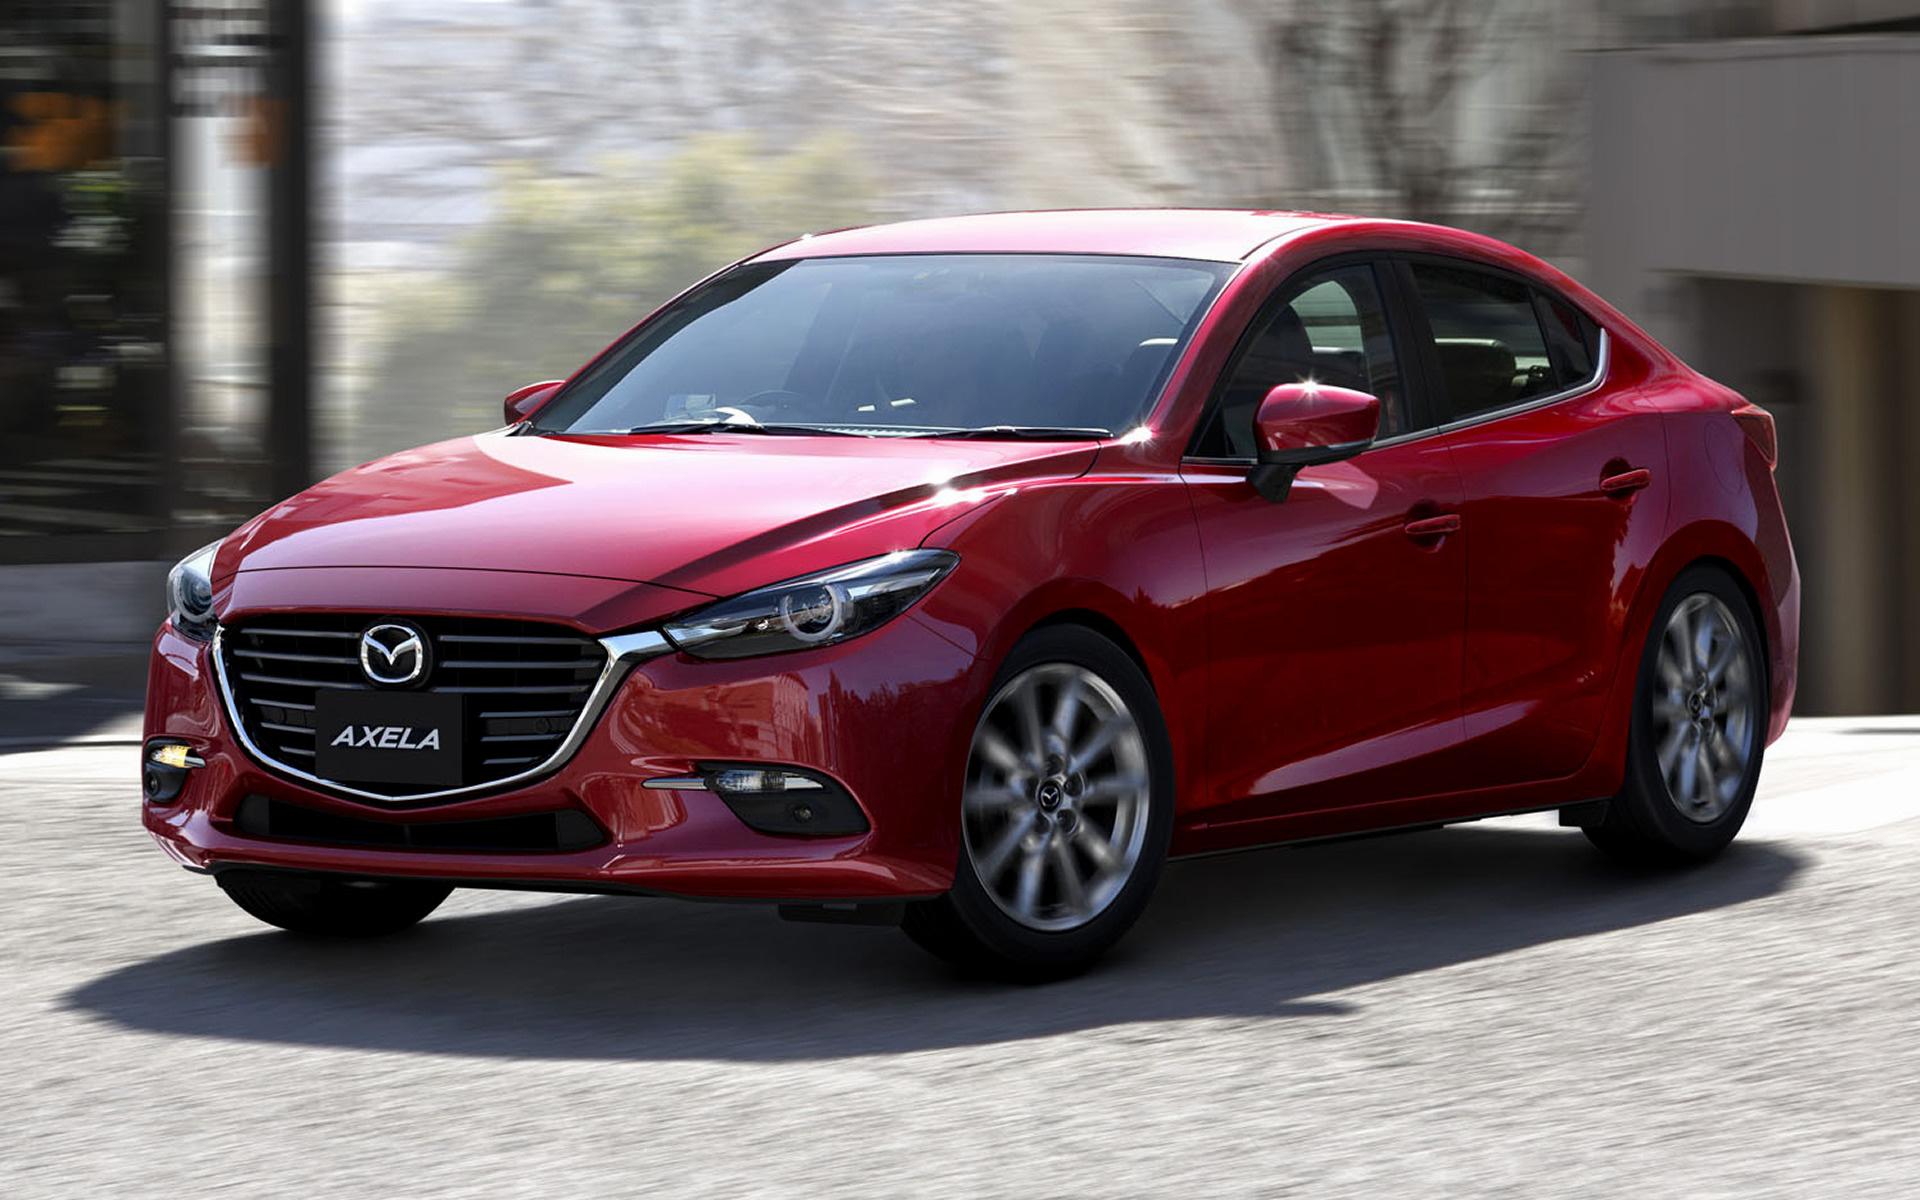 Mazda Axela Sedan 2016 Wallpapers And HD Images Car Pixel